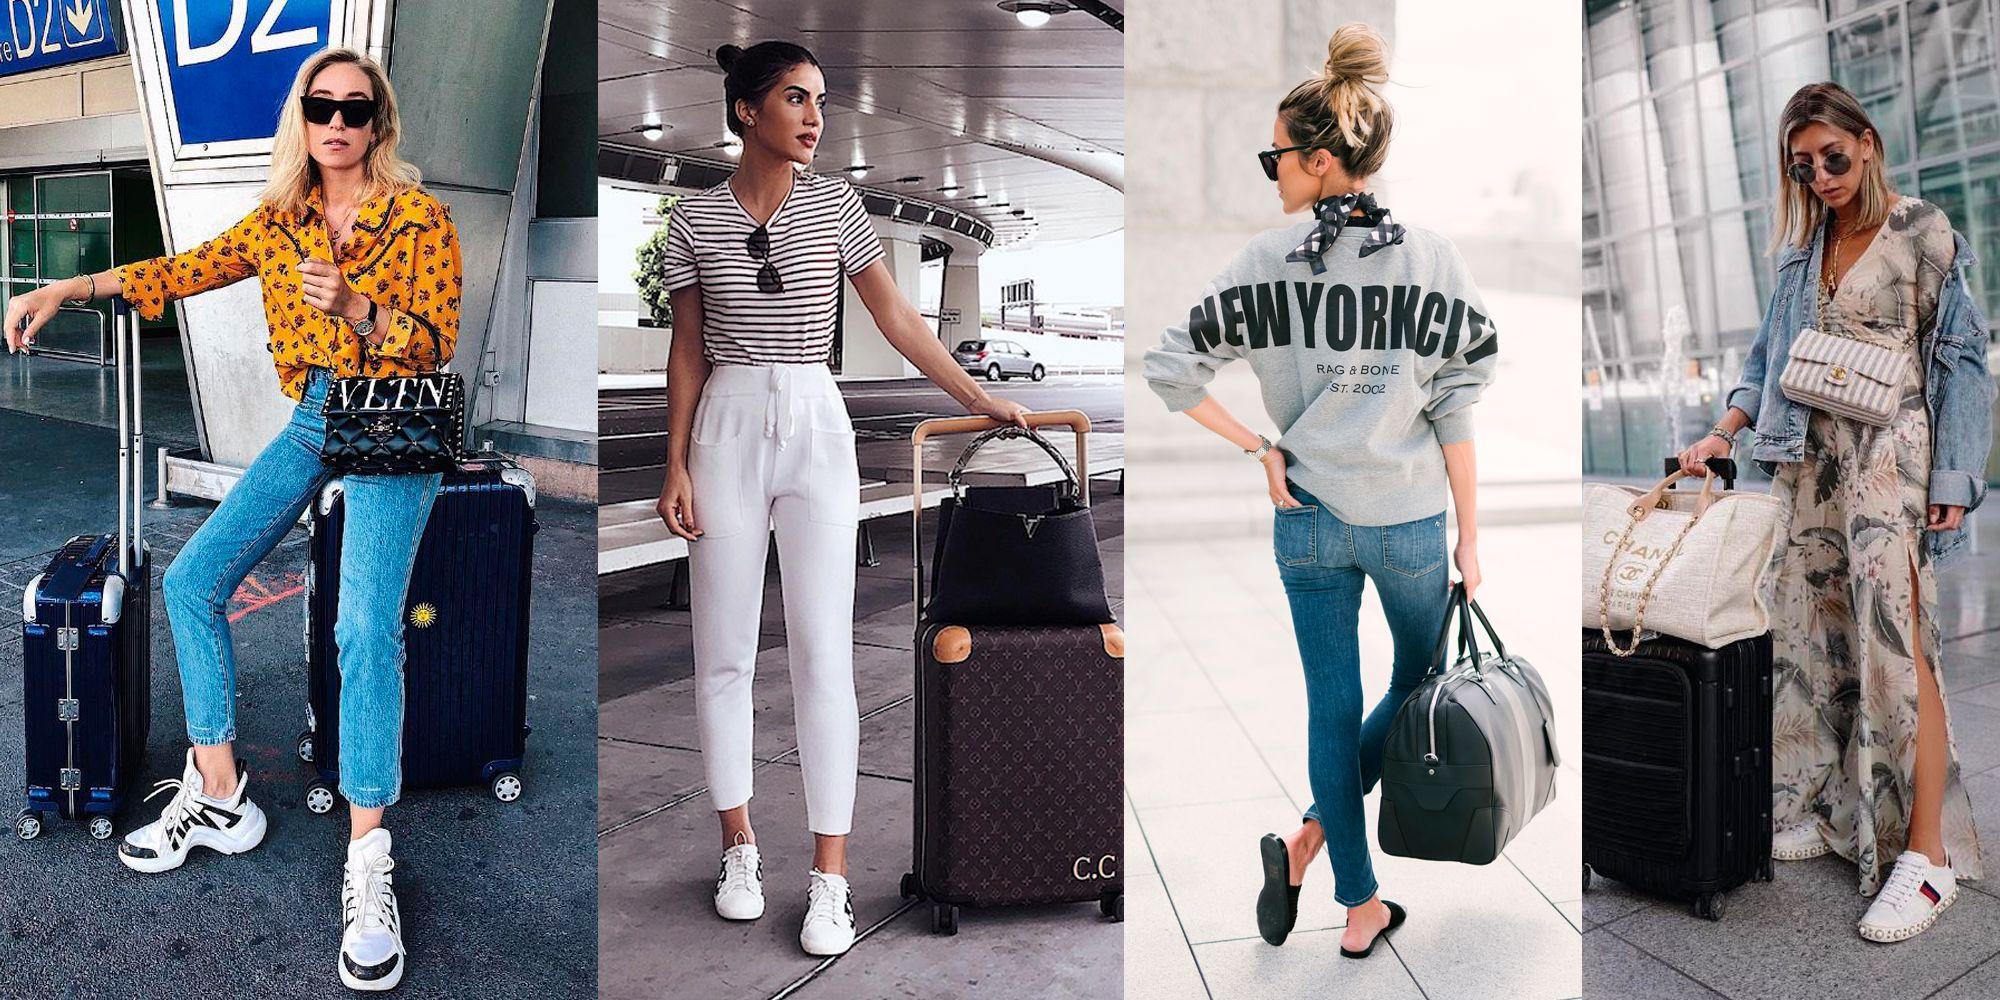 Viajar Al Extranjero La App De Moda Para Viajar Por Europa: UMA PRIMAVERA VERANO 2019 MODA Y ESTILO CASUAL CHIC